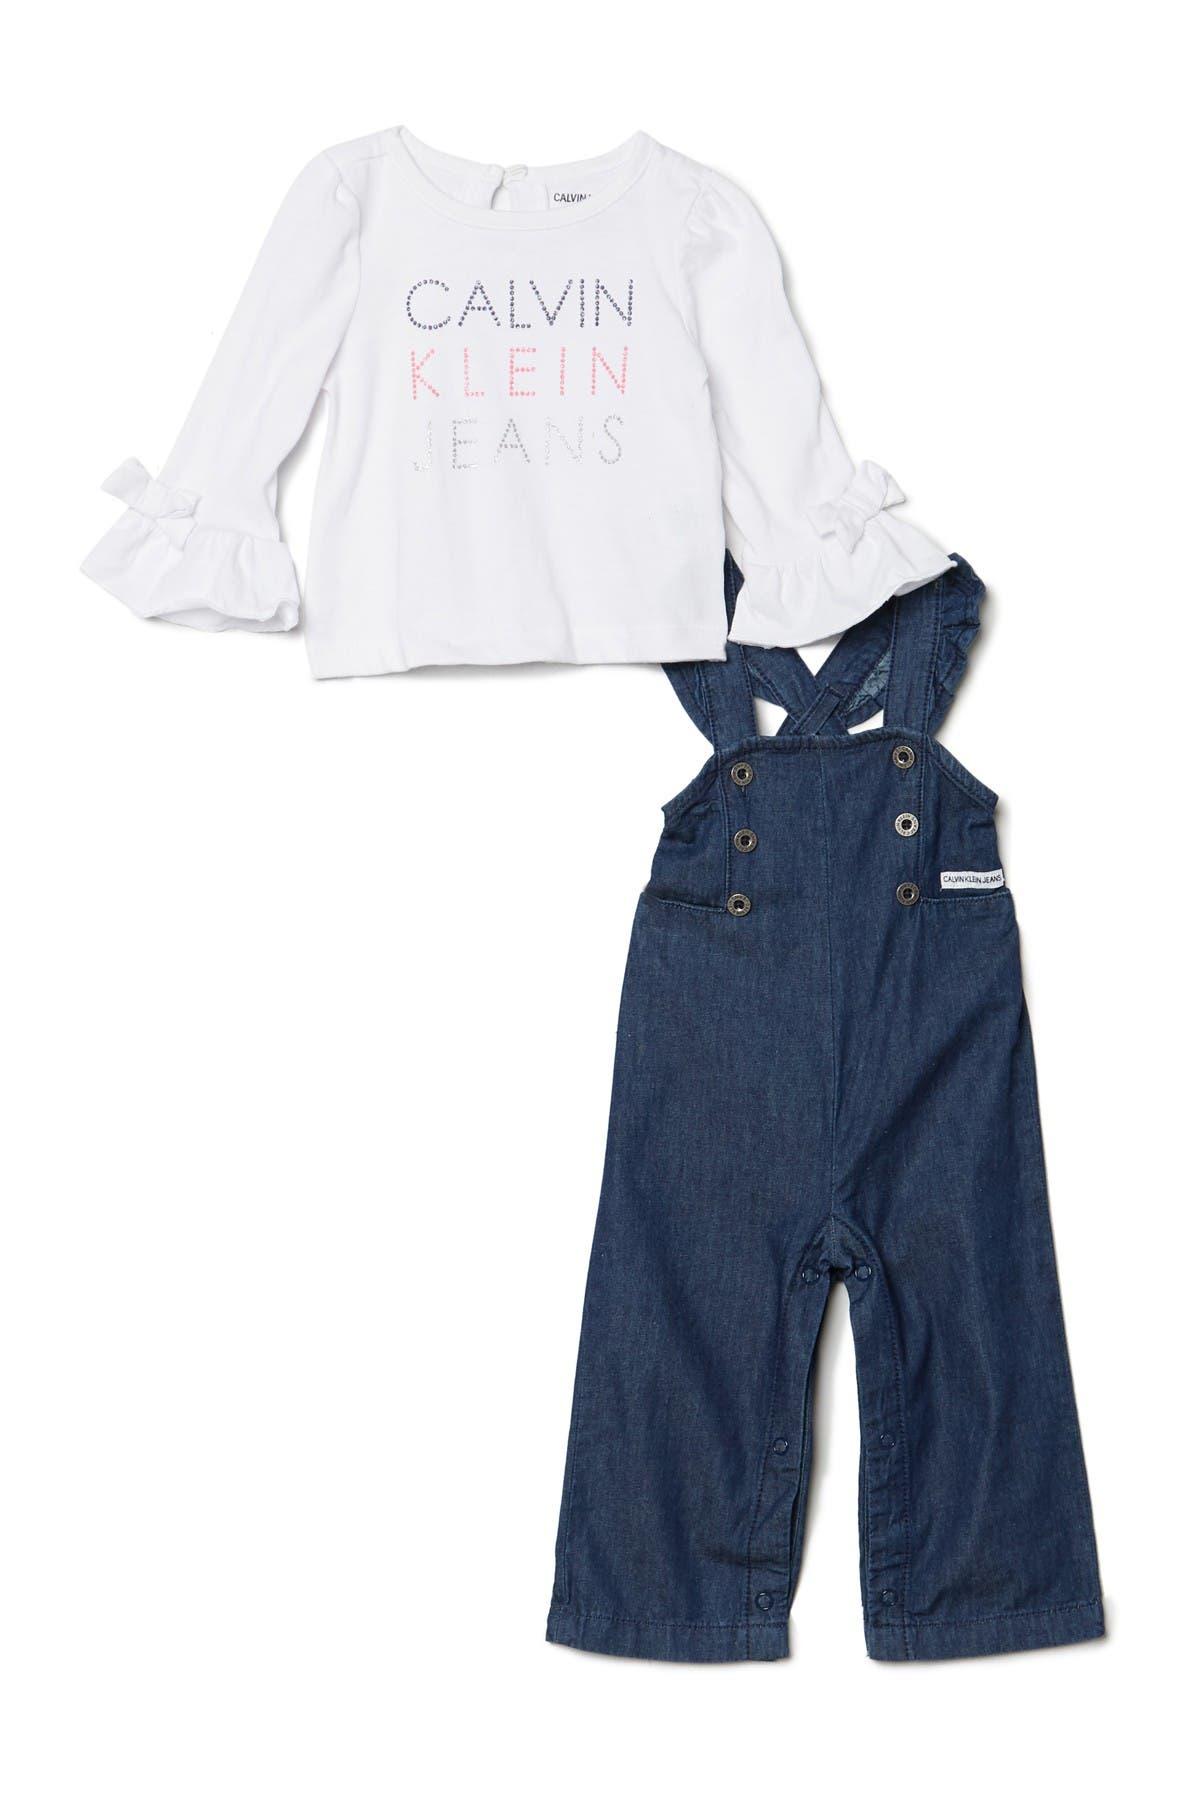 Image of Calvin Klein Overalls Set